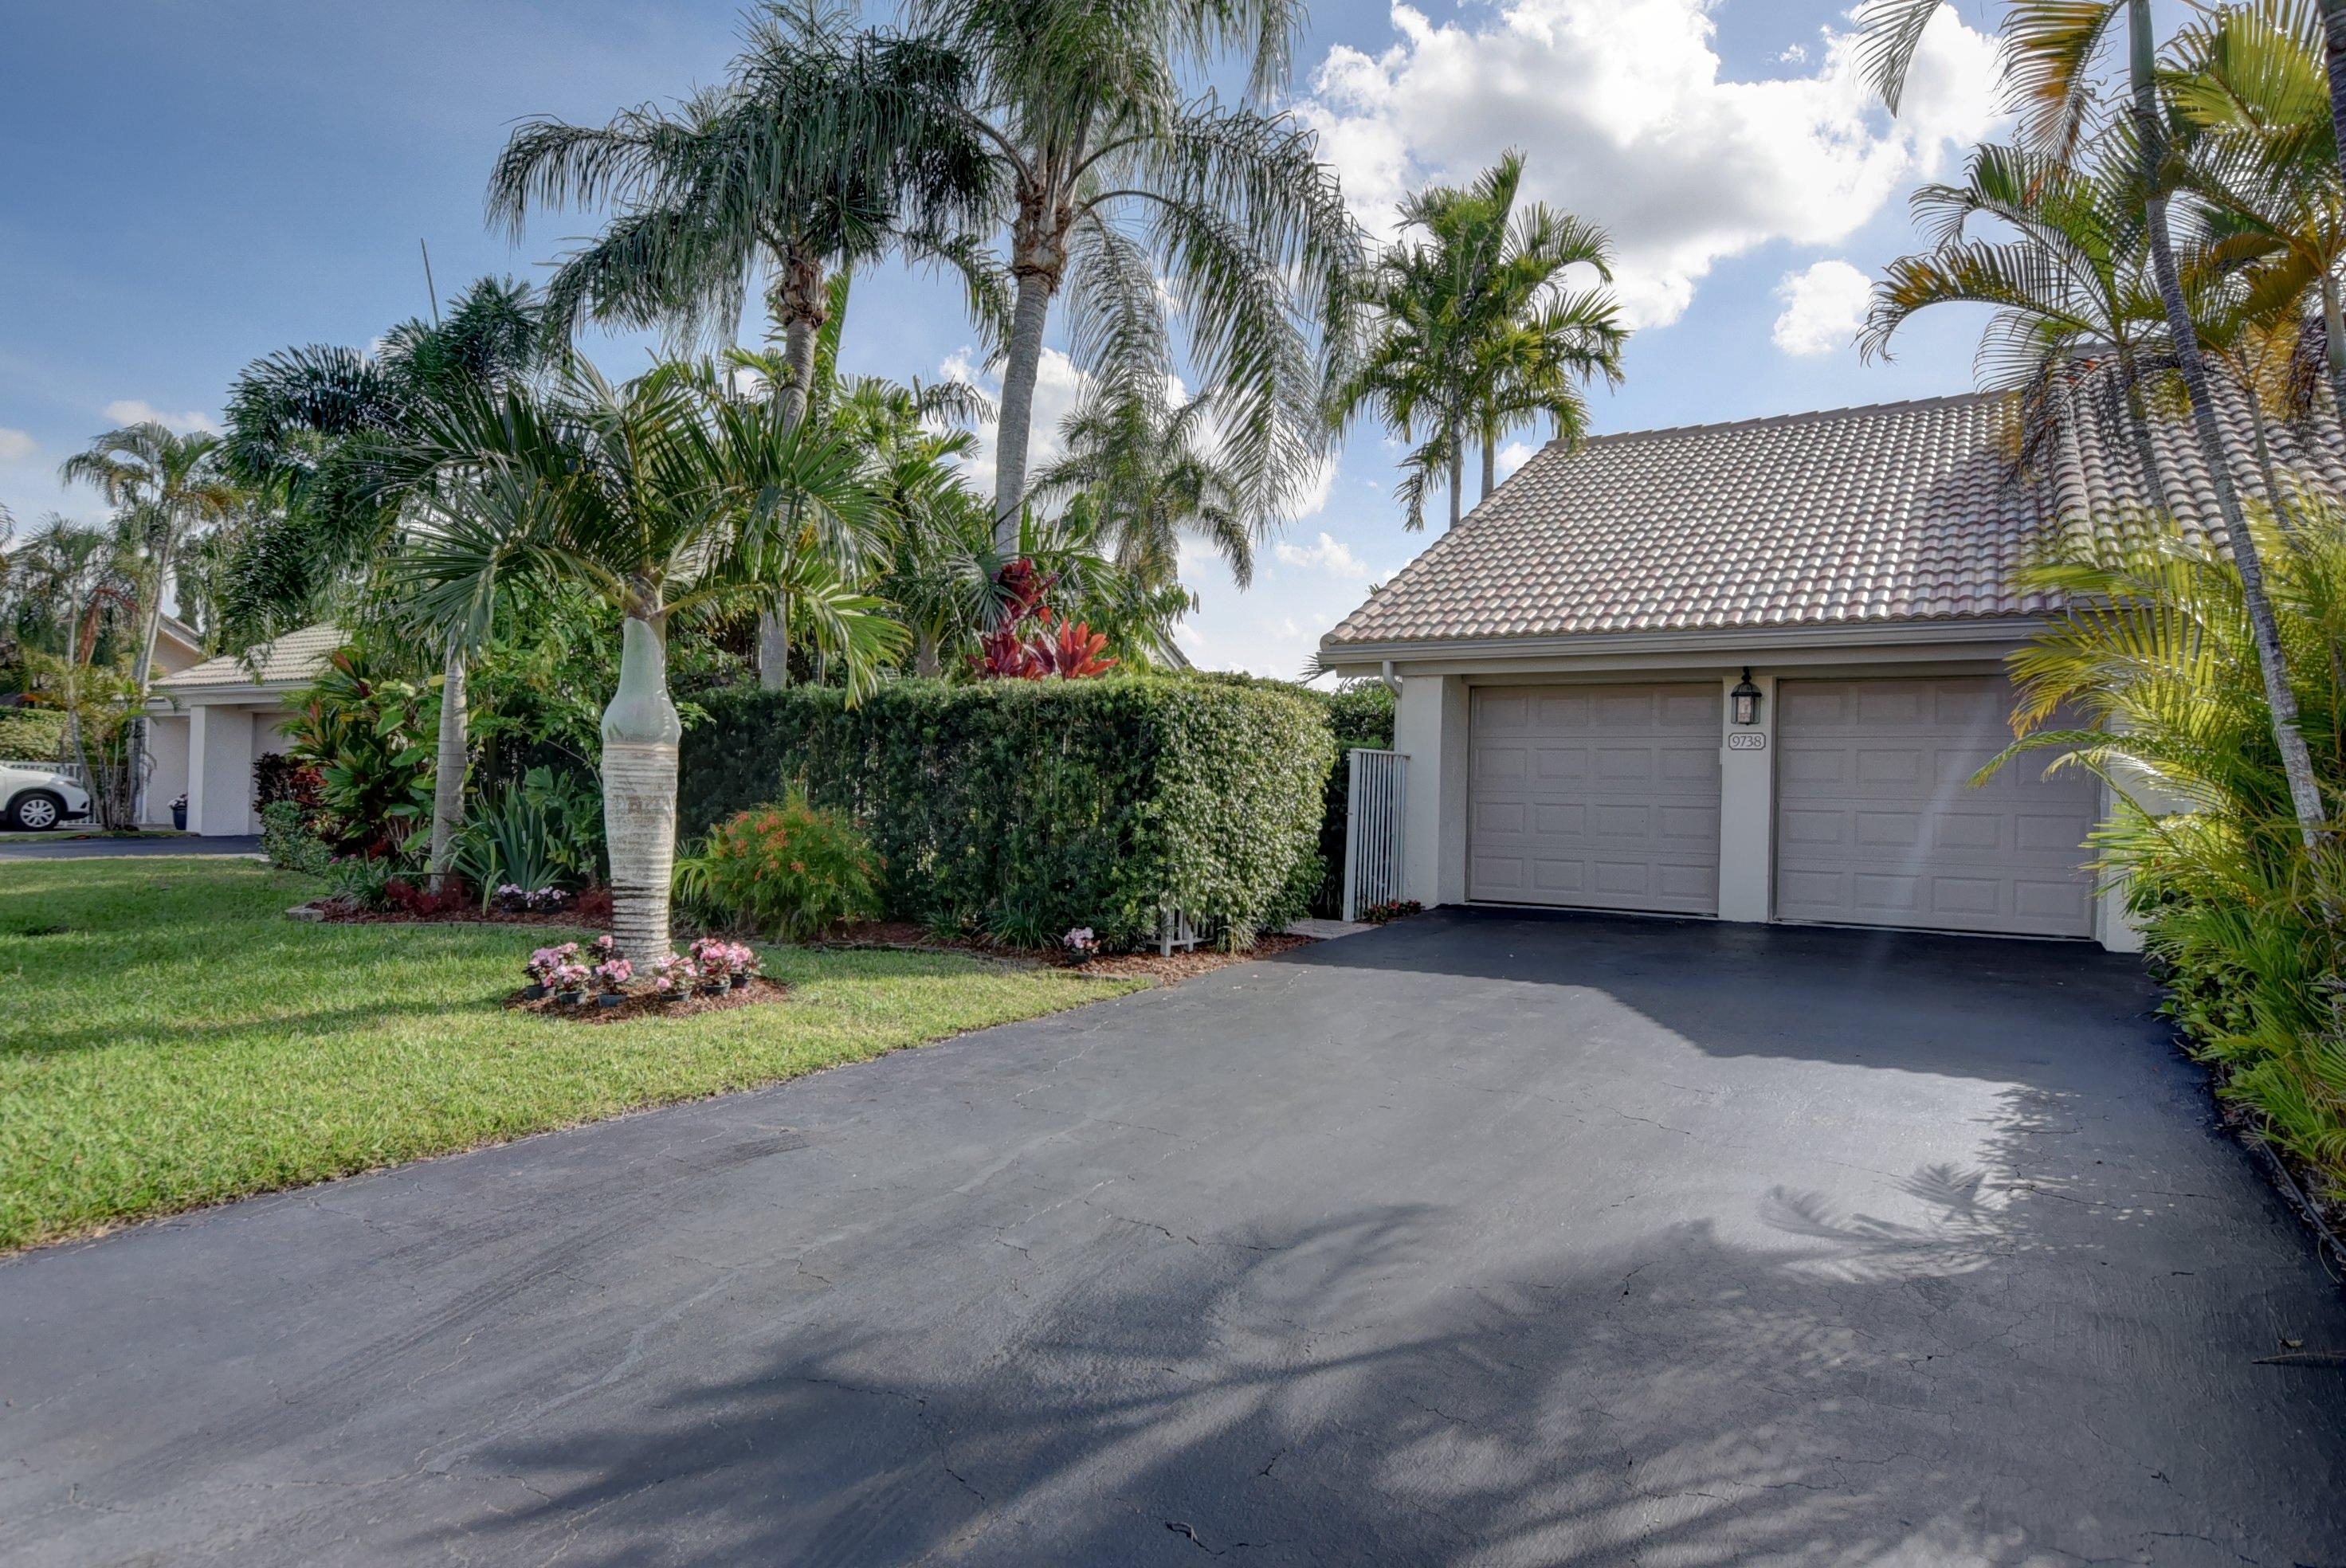 9738 Erica Court Boca Raton, FL 33496